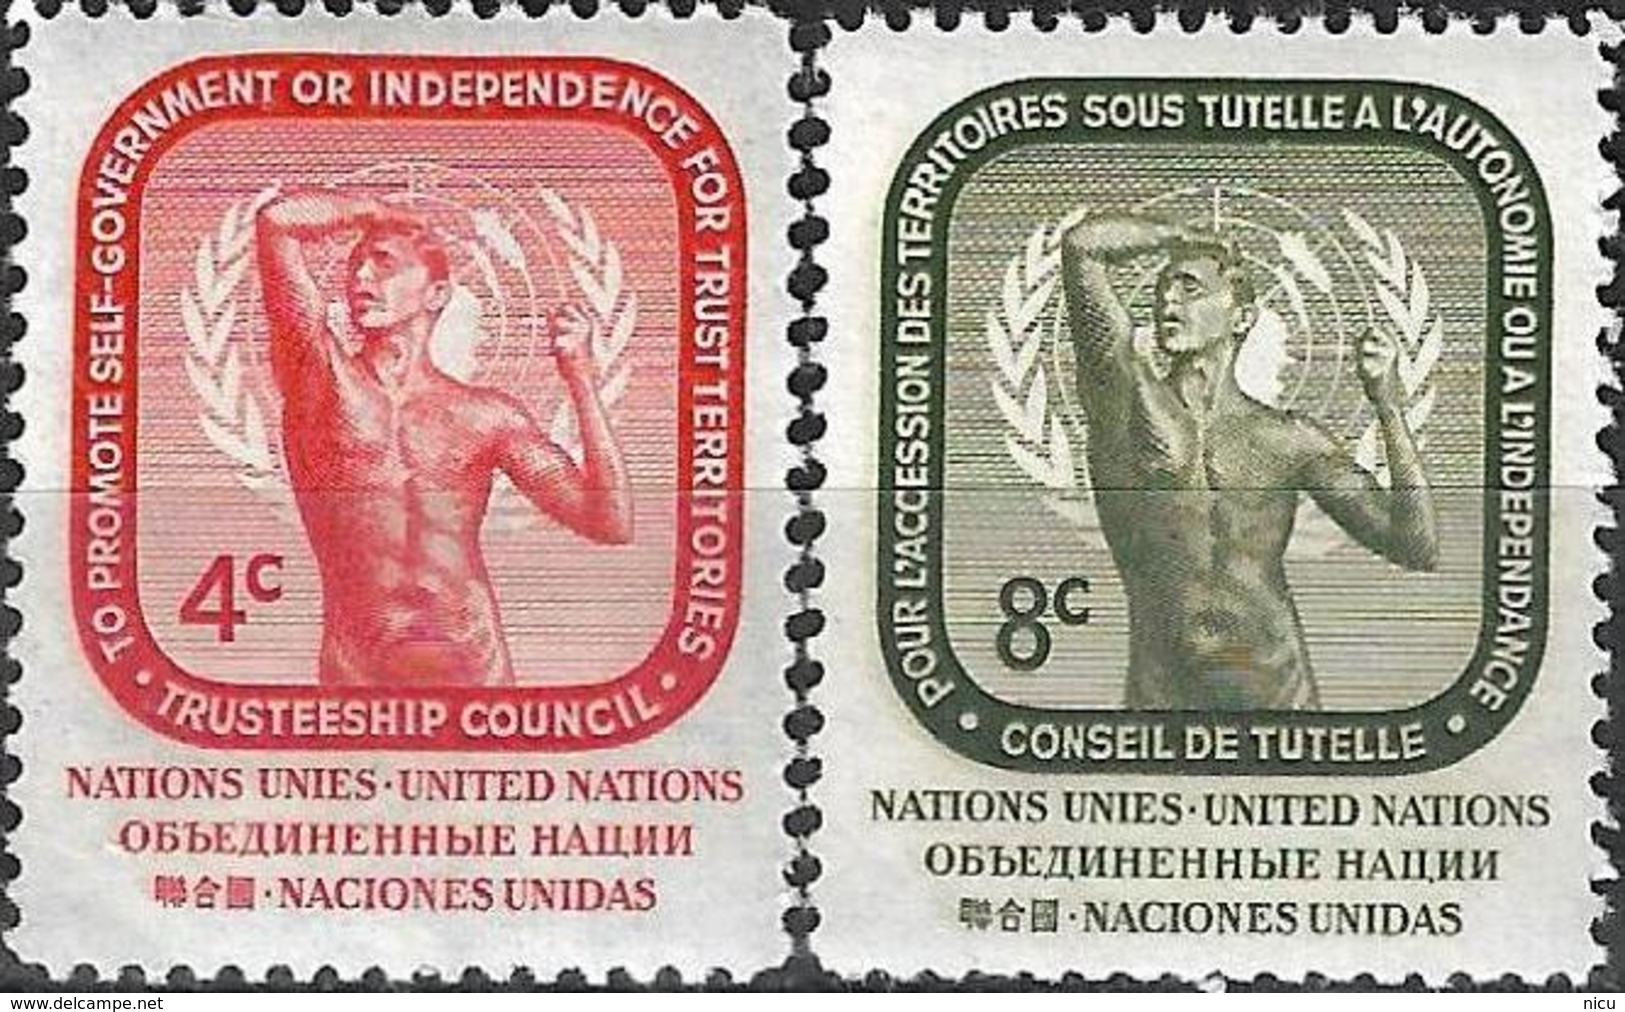 1959 - THUSTEESHIP COUNCIL - Michel Nr. 80-81 = 0.60 € - New York -  VN Hauptquartier